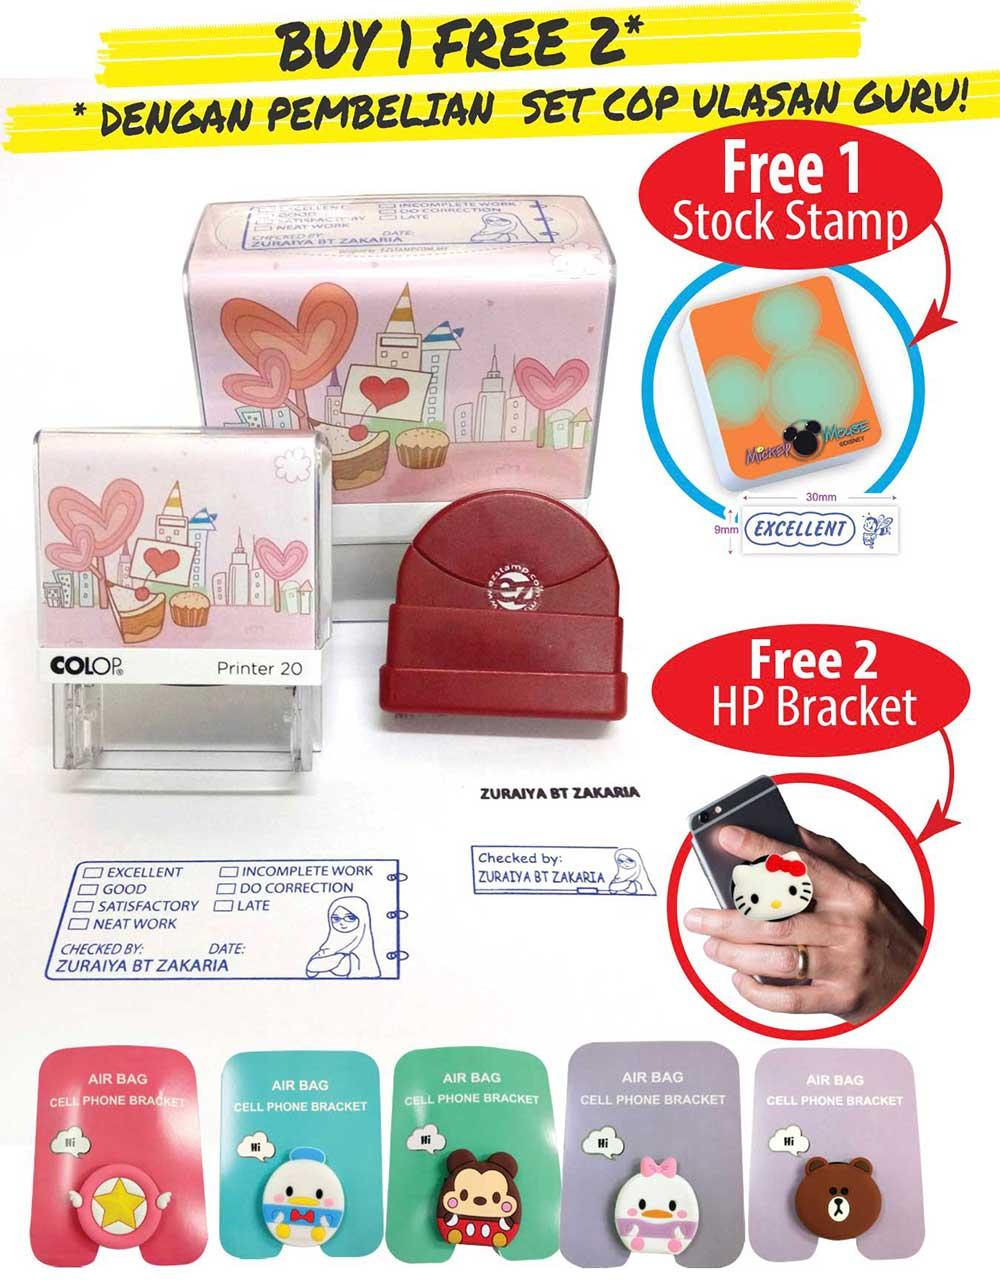 buy-1-free-2-promo.jpg